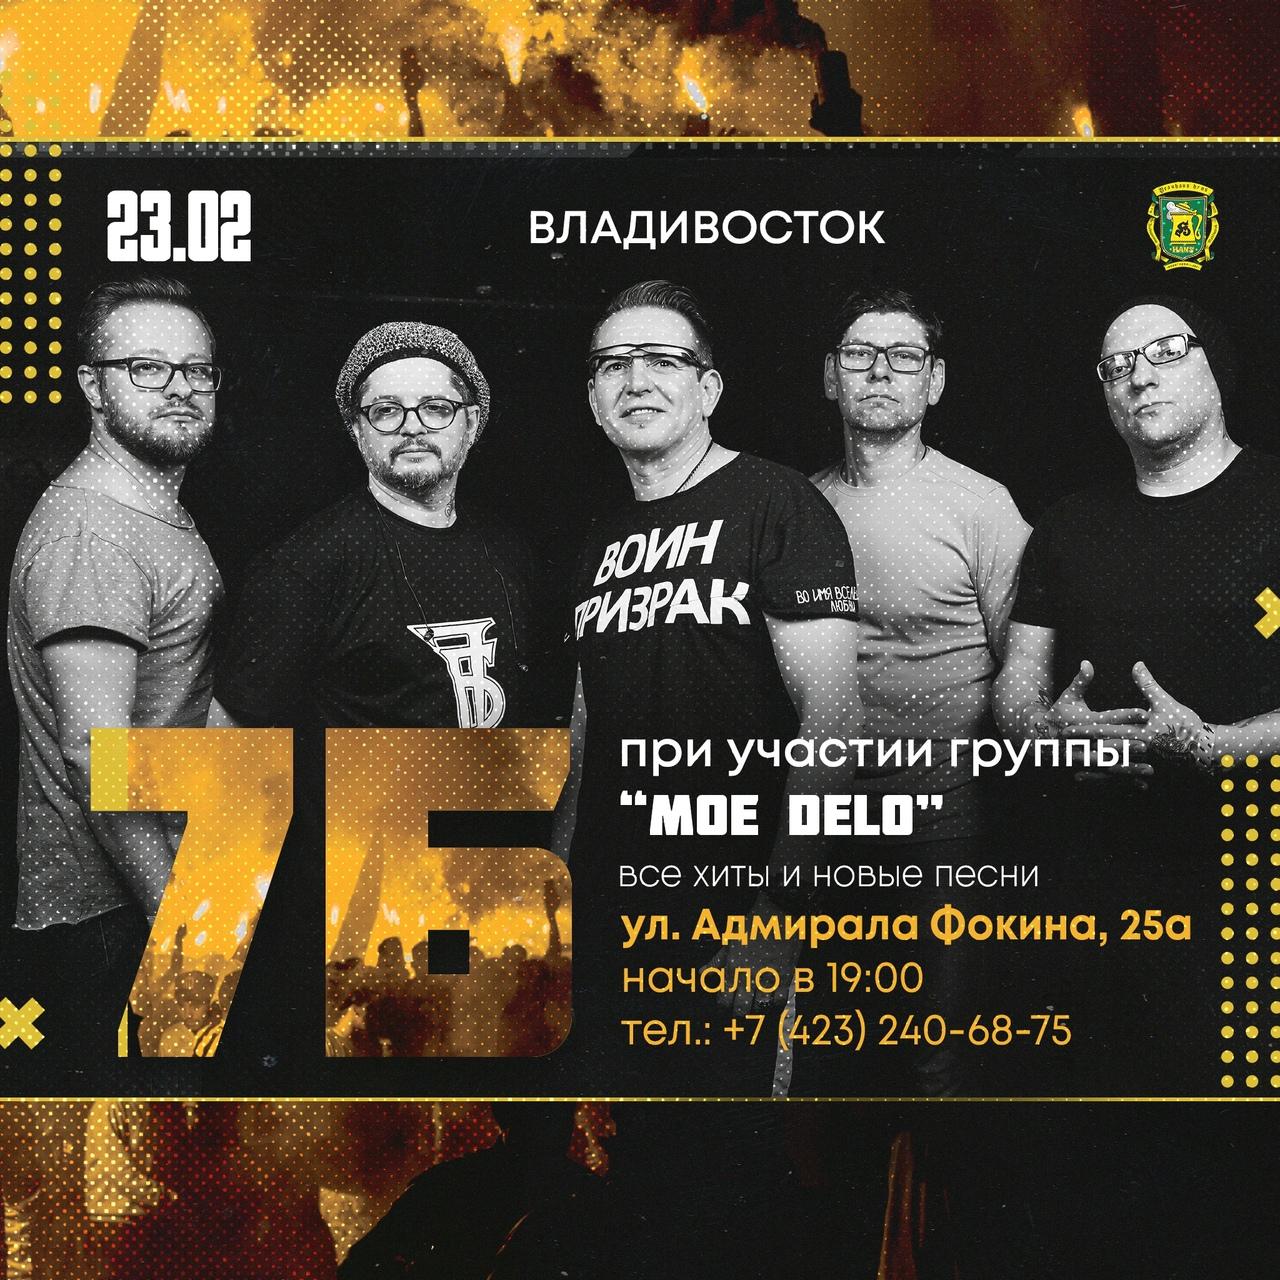 Афиша ГРУППА «7Б» / 23 ФЕВРАЛЯ / ВЛАДИВОСТОК